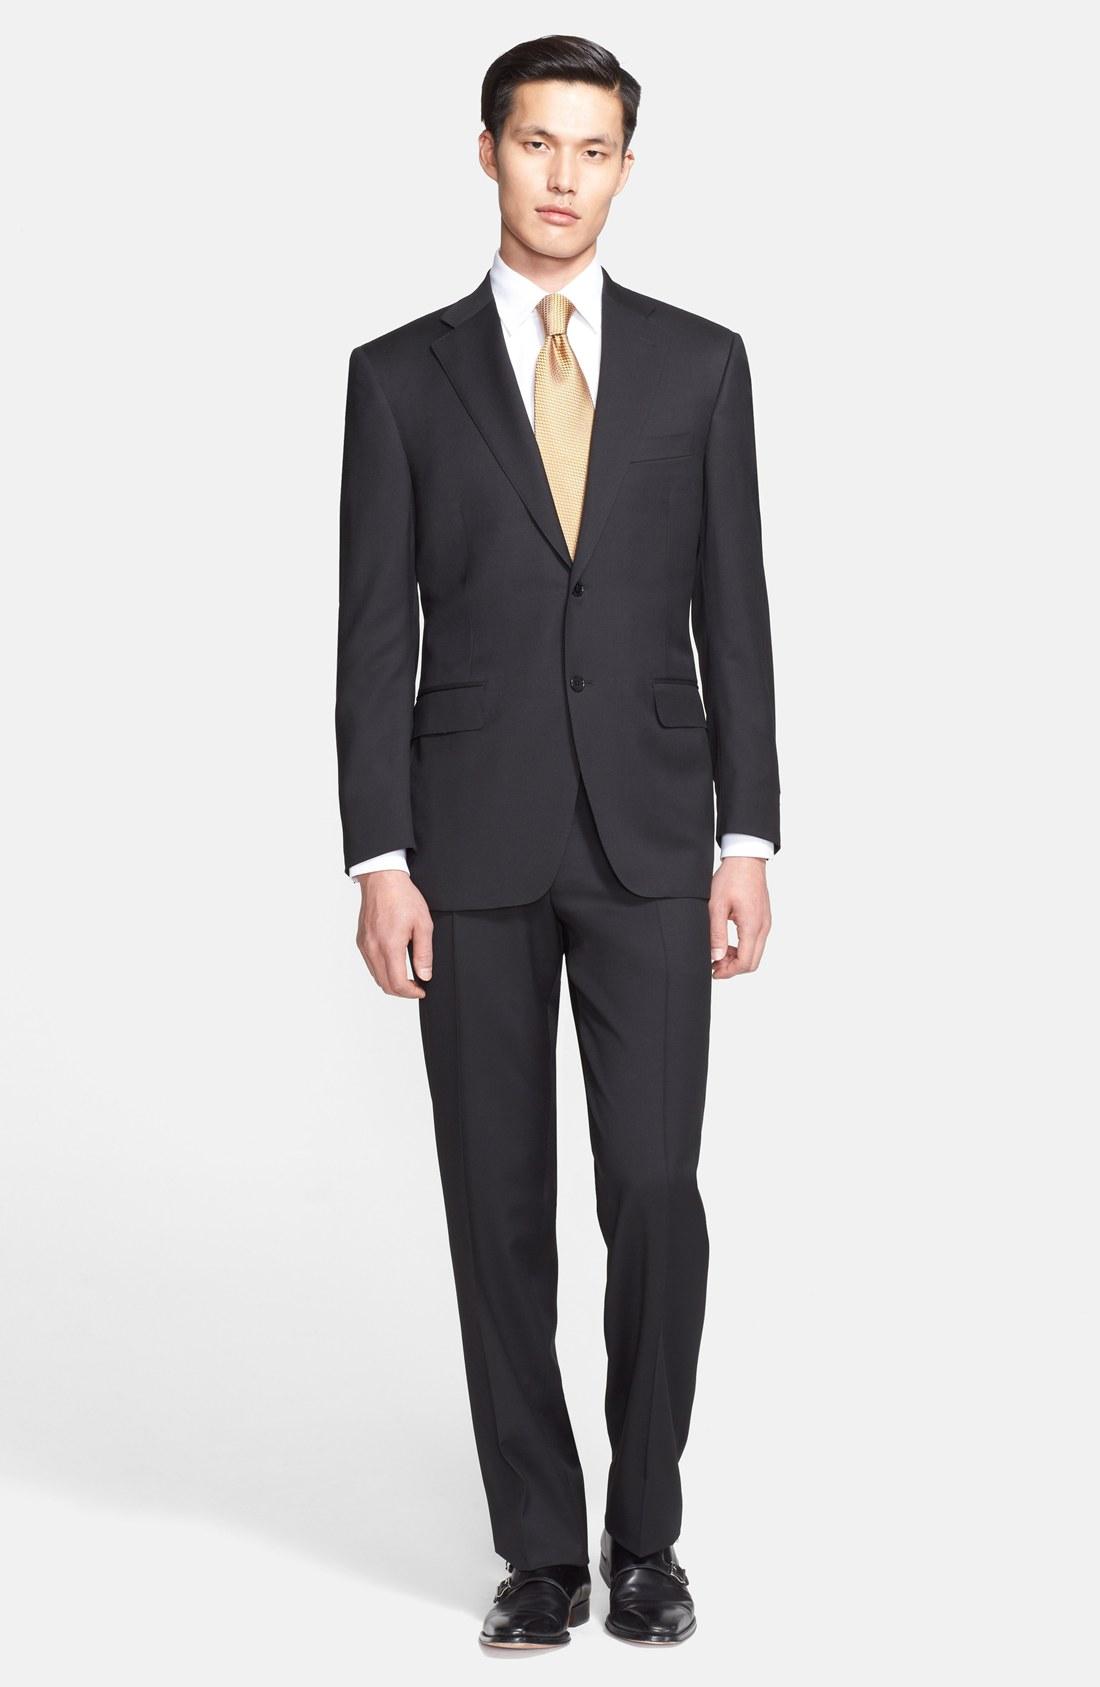 HQ Suit Wallpapers | File 95.51Kb